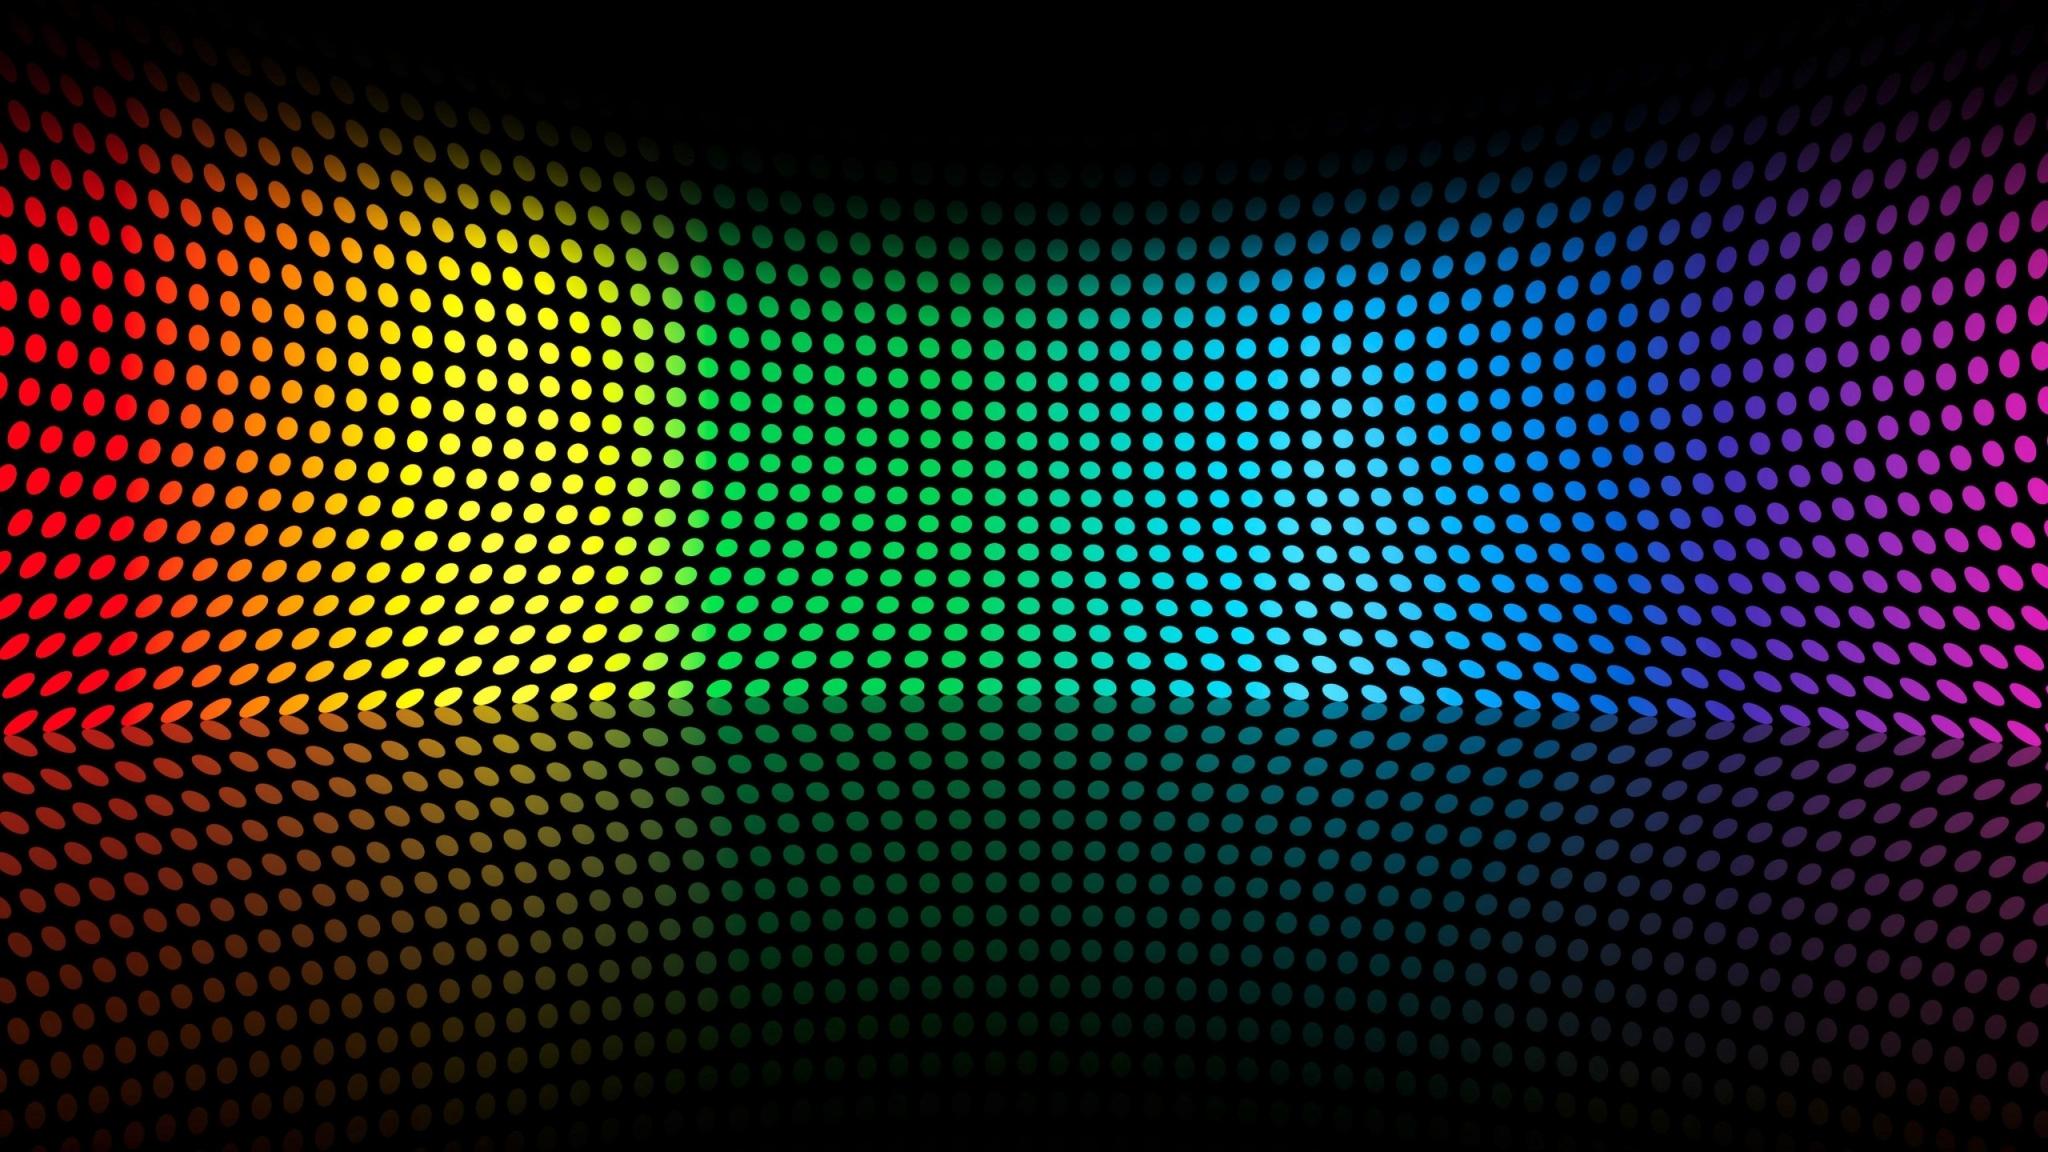 hd desktop wallpapers 2048x1152 -#main